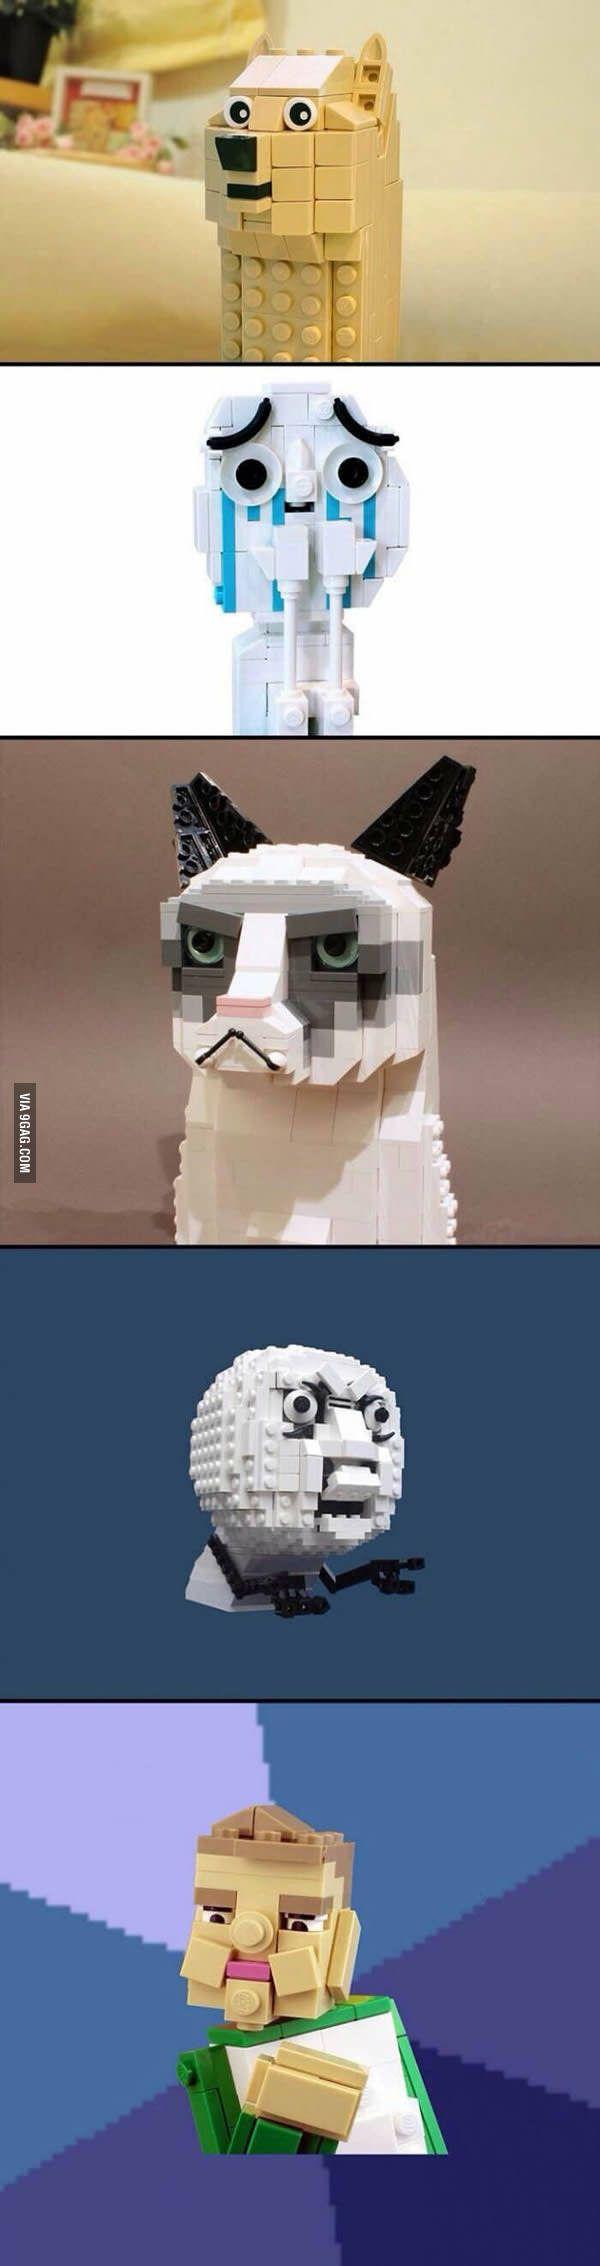 Lego version of memes. - 9GAG